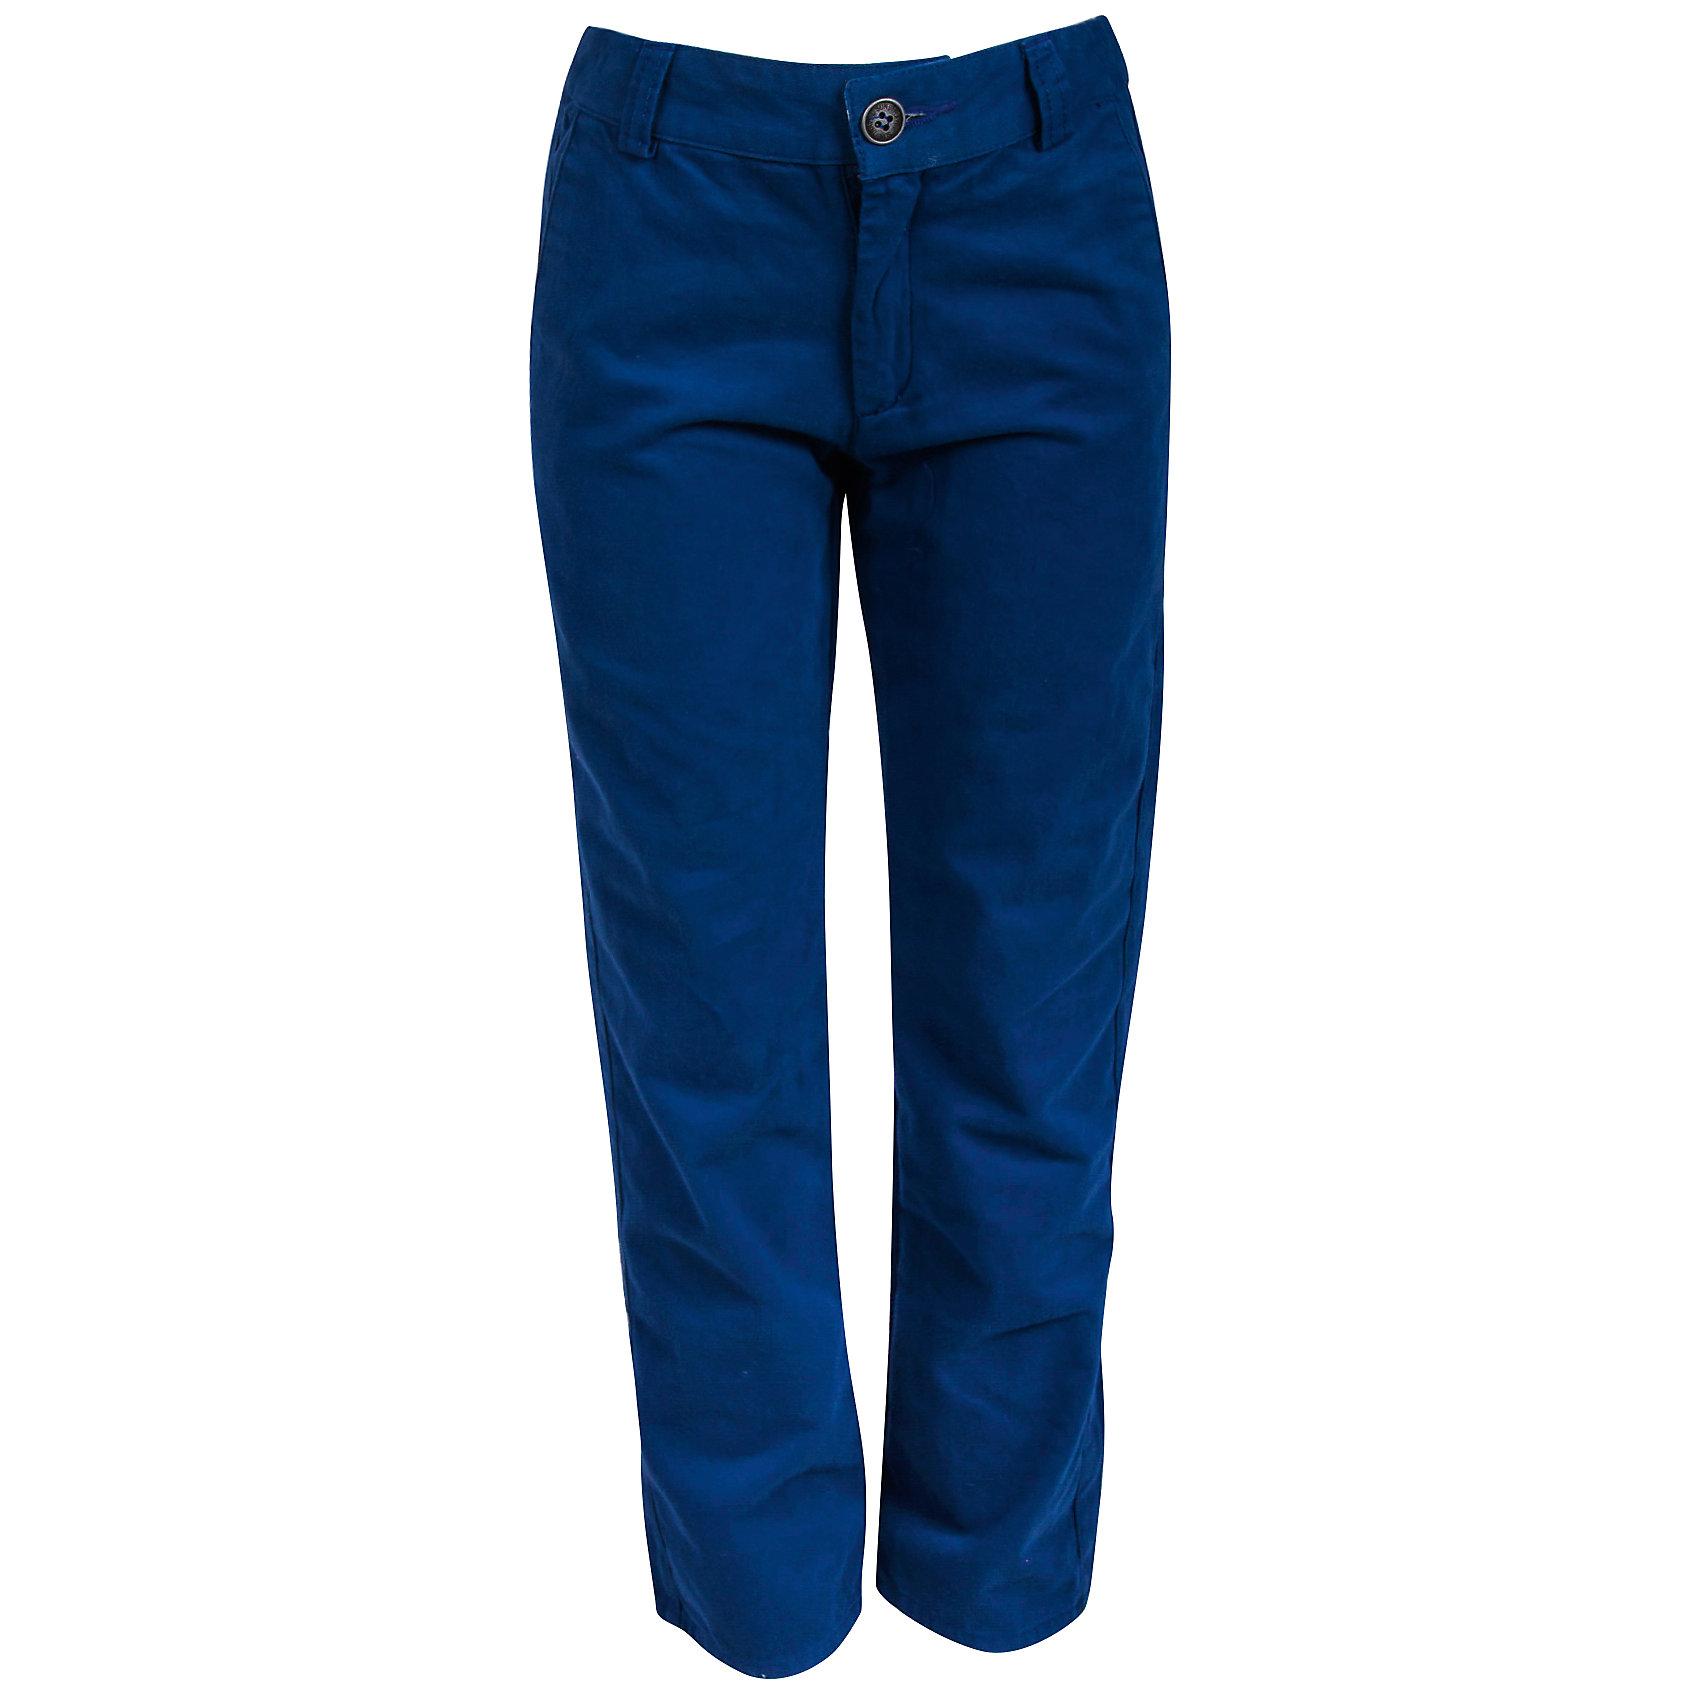 Брюки для мальчика Bell BimboБрюки для мальчика от марки Bell Bimbo.<br>Однотонные брюки дополнены двумя  карманами спереди, двумя  карманами сзади, застежка молния+пуговица,  шлёвки для ремня.<br>Состав:<br>твил 100% хлопок<br><br>Ширина мм: 215<br>Глубина мм: 88<br>Высота мм: 191<br>Вес г: 336<br>Цвет: синий<br>Возраст от месяцев: 24<br>Возраст до месяцев: 36<br>Пол: Мужской<br>Возраст: Детский<br>Размер: 98,122,116,110,104<br>SKU: 4578888